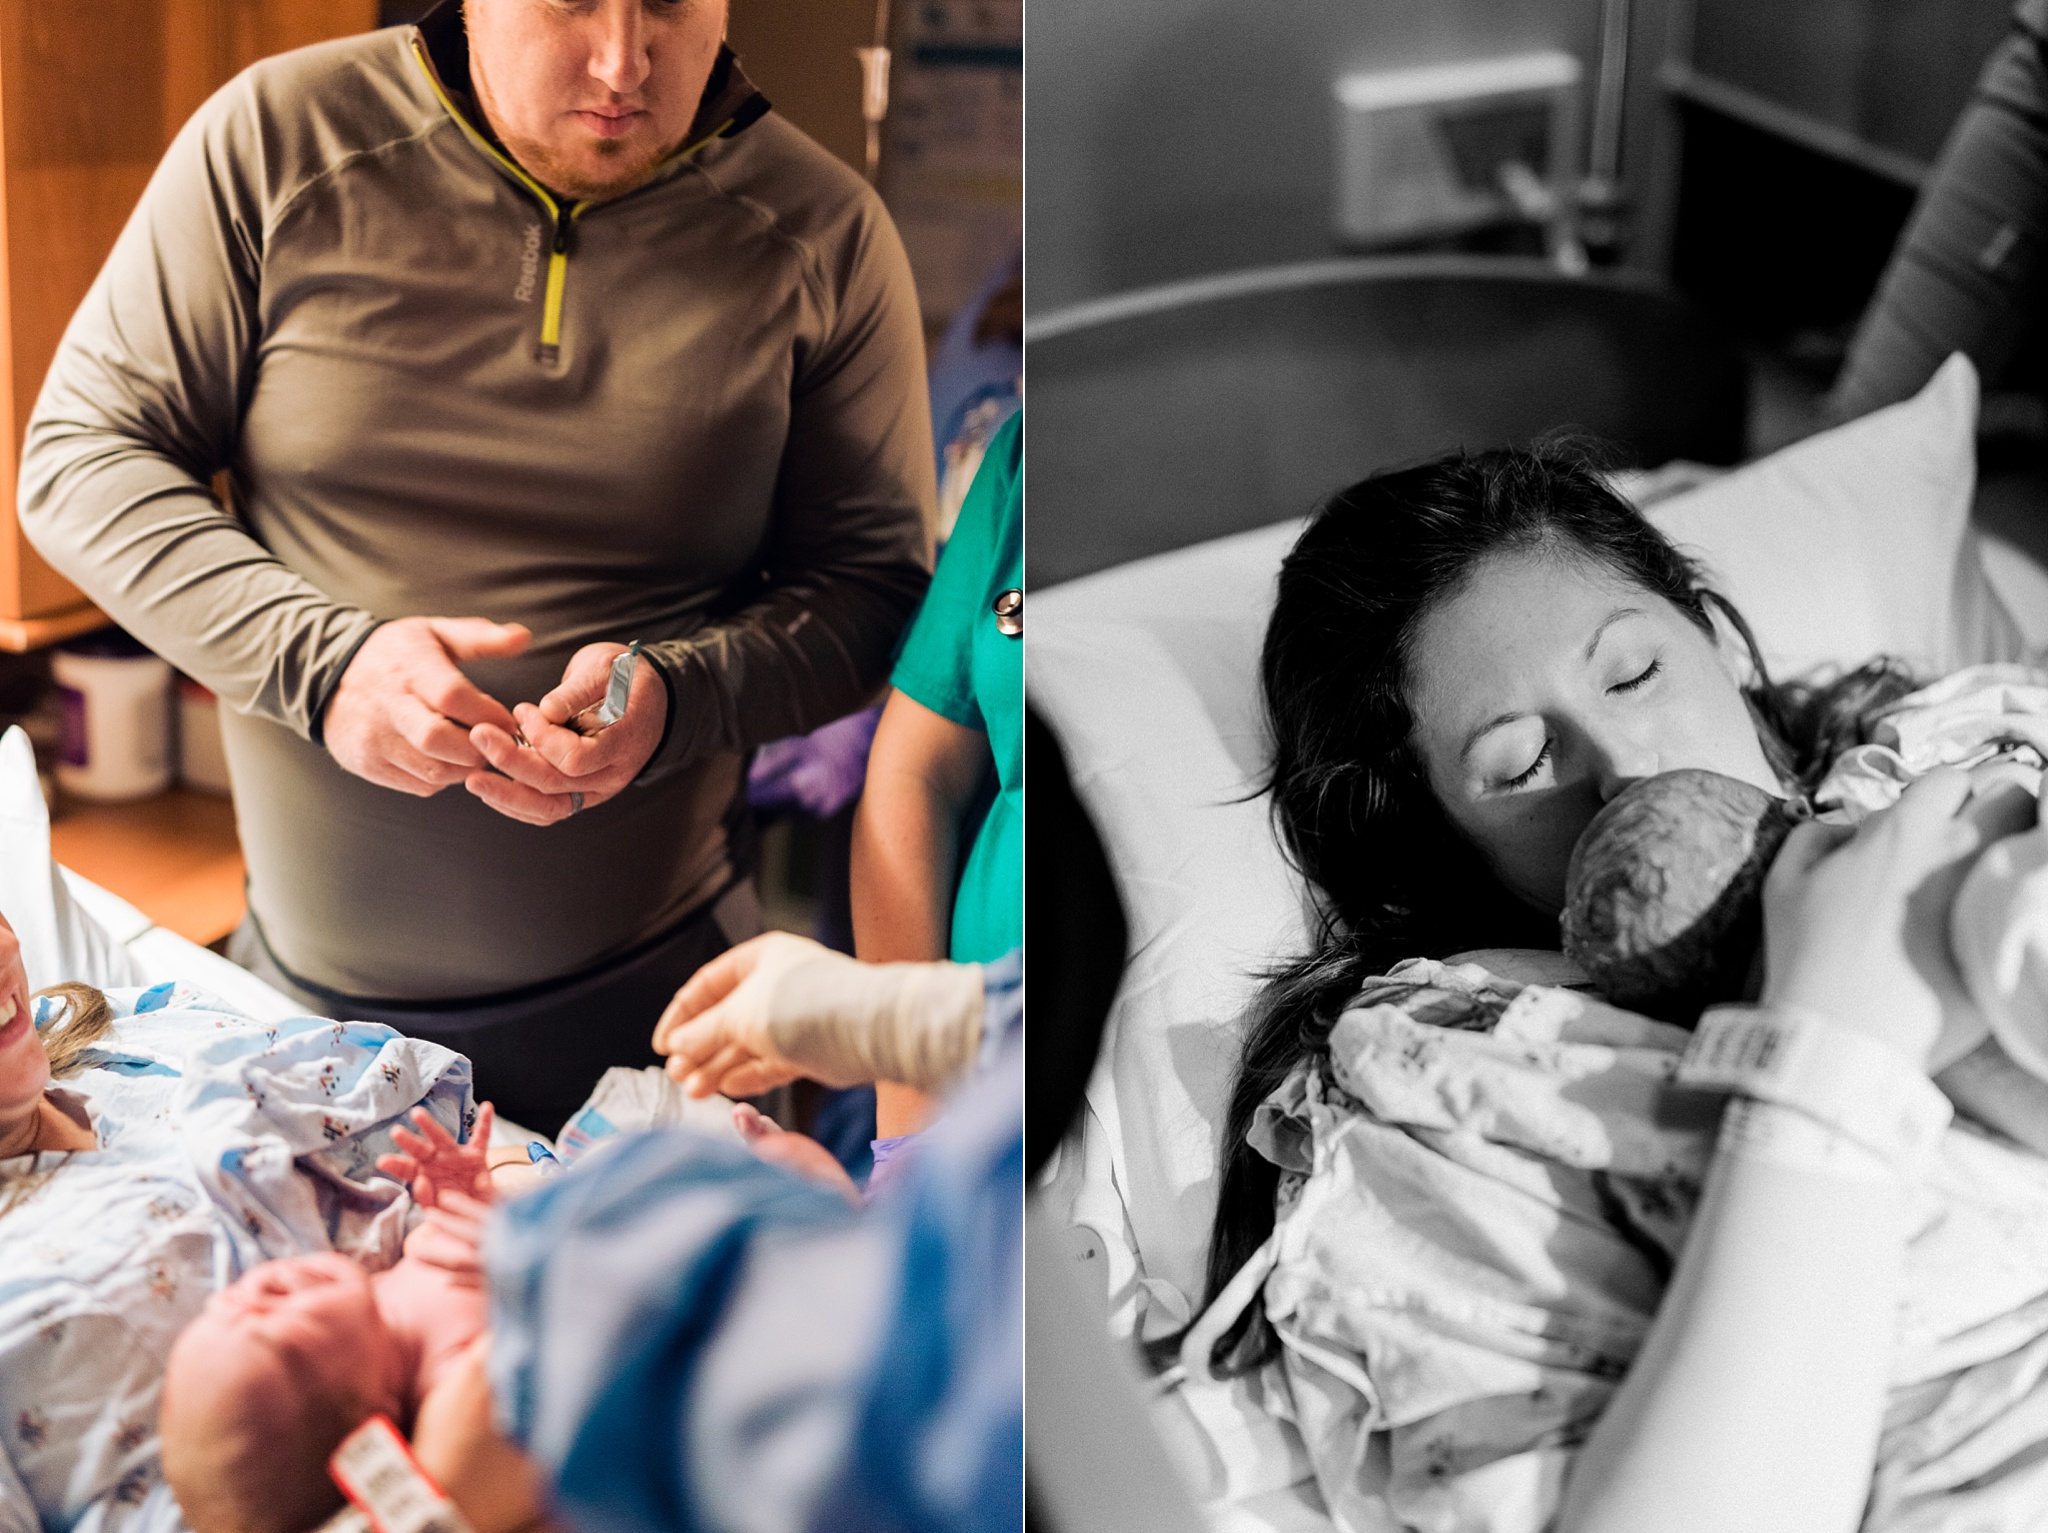 atlanta-birth-photographer-piedmont-fayette-hospital-birth-mallievinson-64.jpg